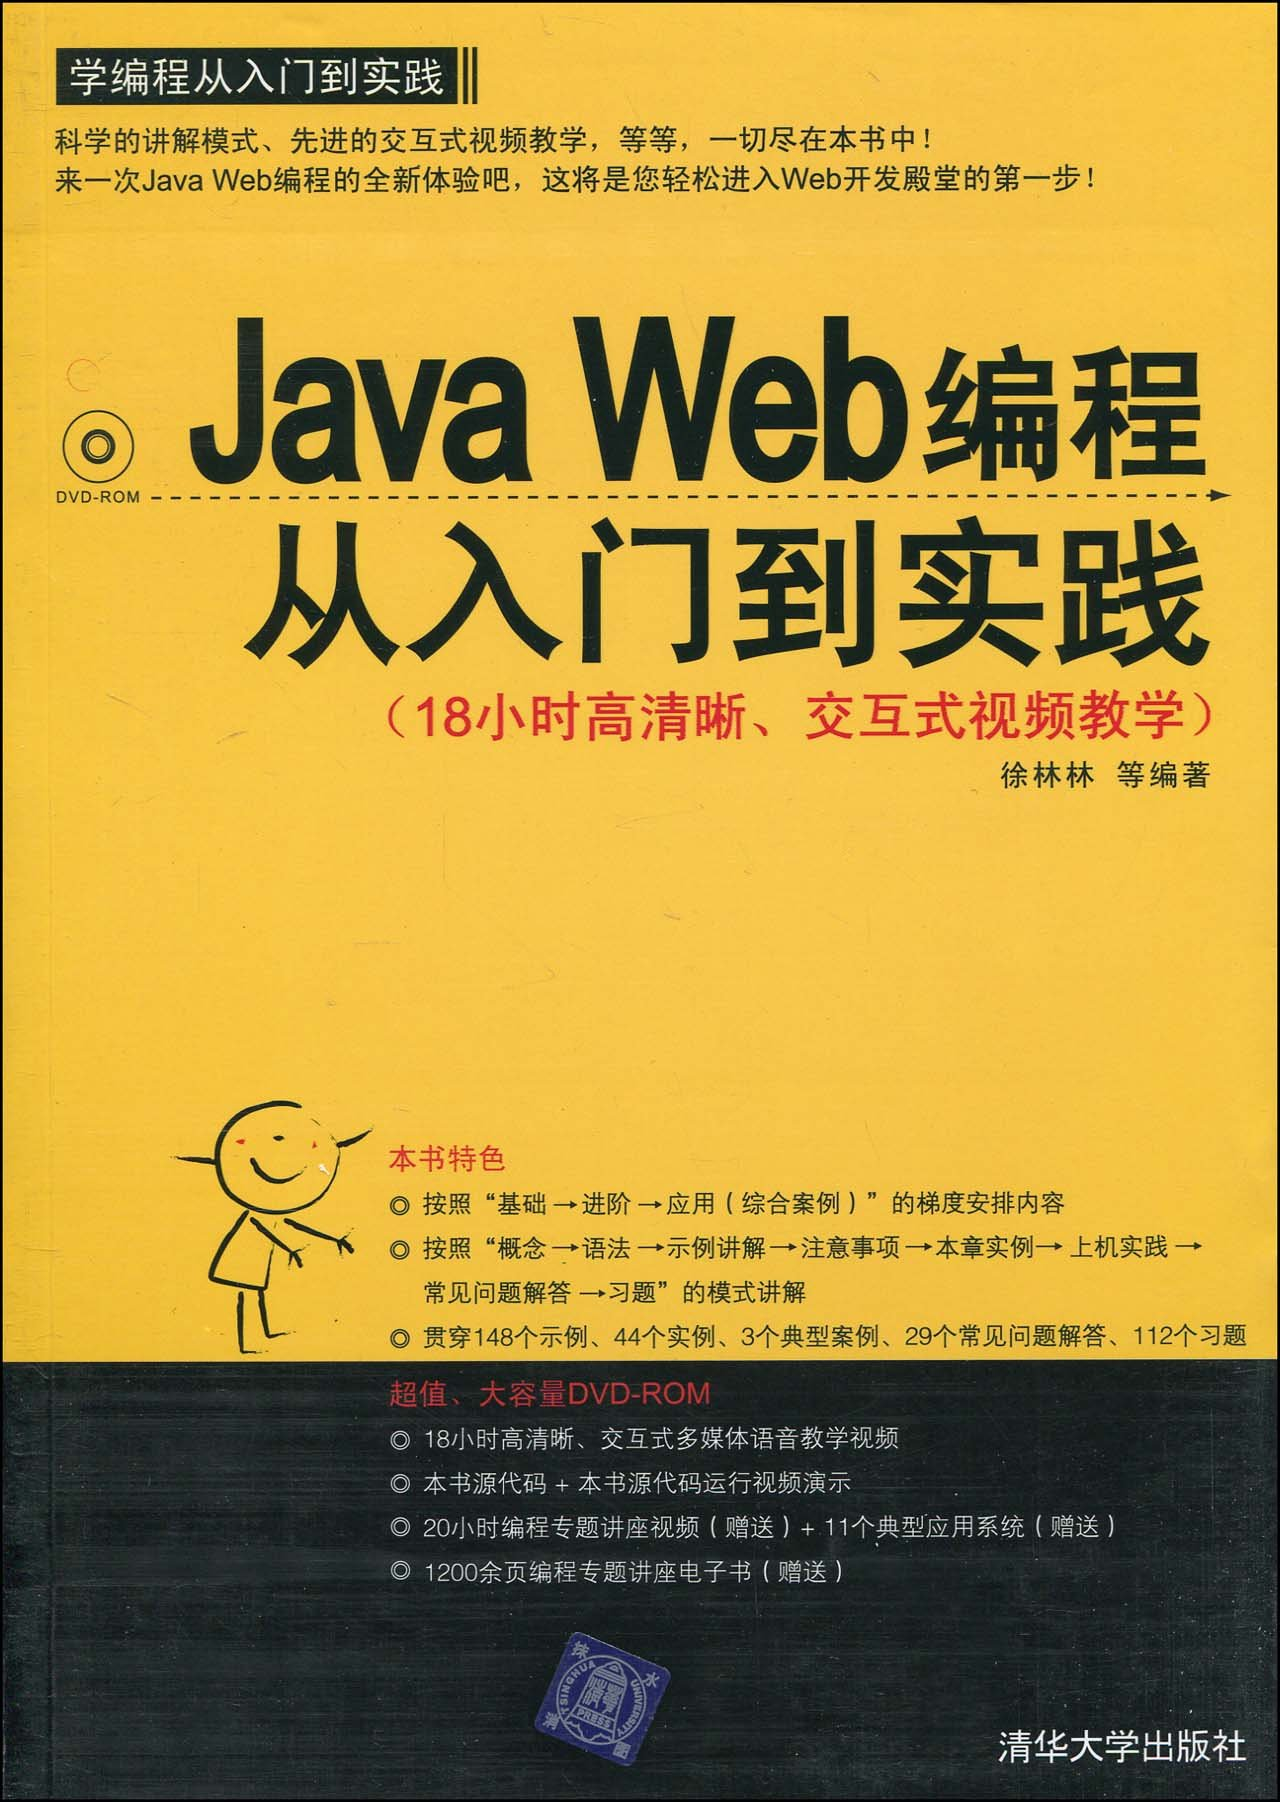 9ef3fc5b4e58f 《学编程从入门到实践•Java Web编程从入门到实践》 徐林林, 等【摘要书评试读】图书